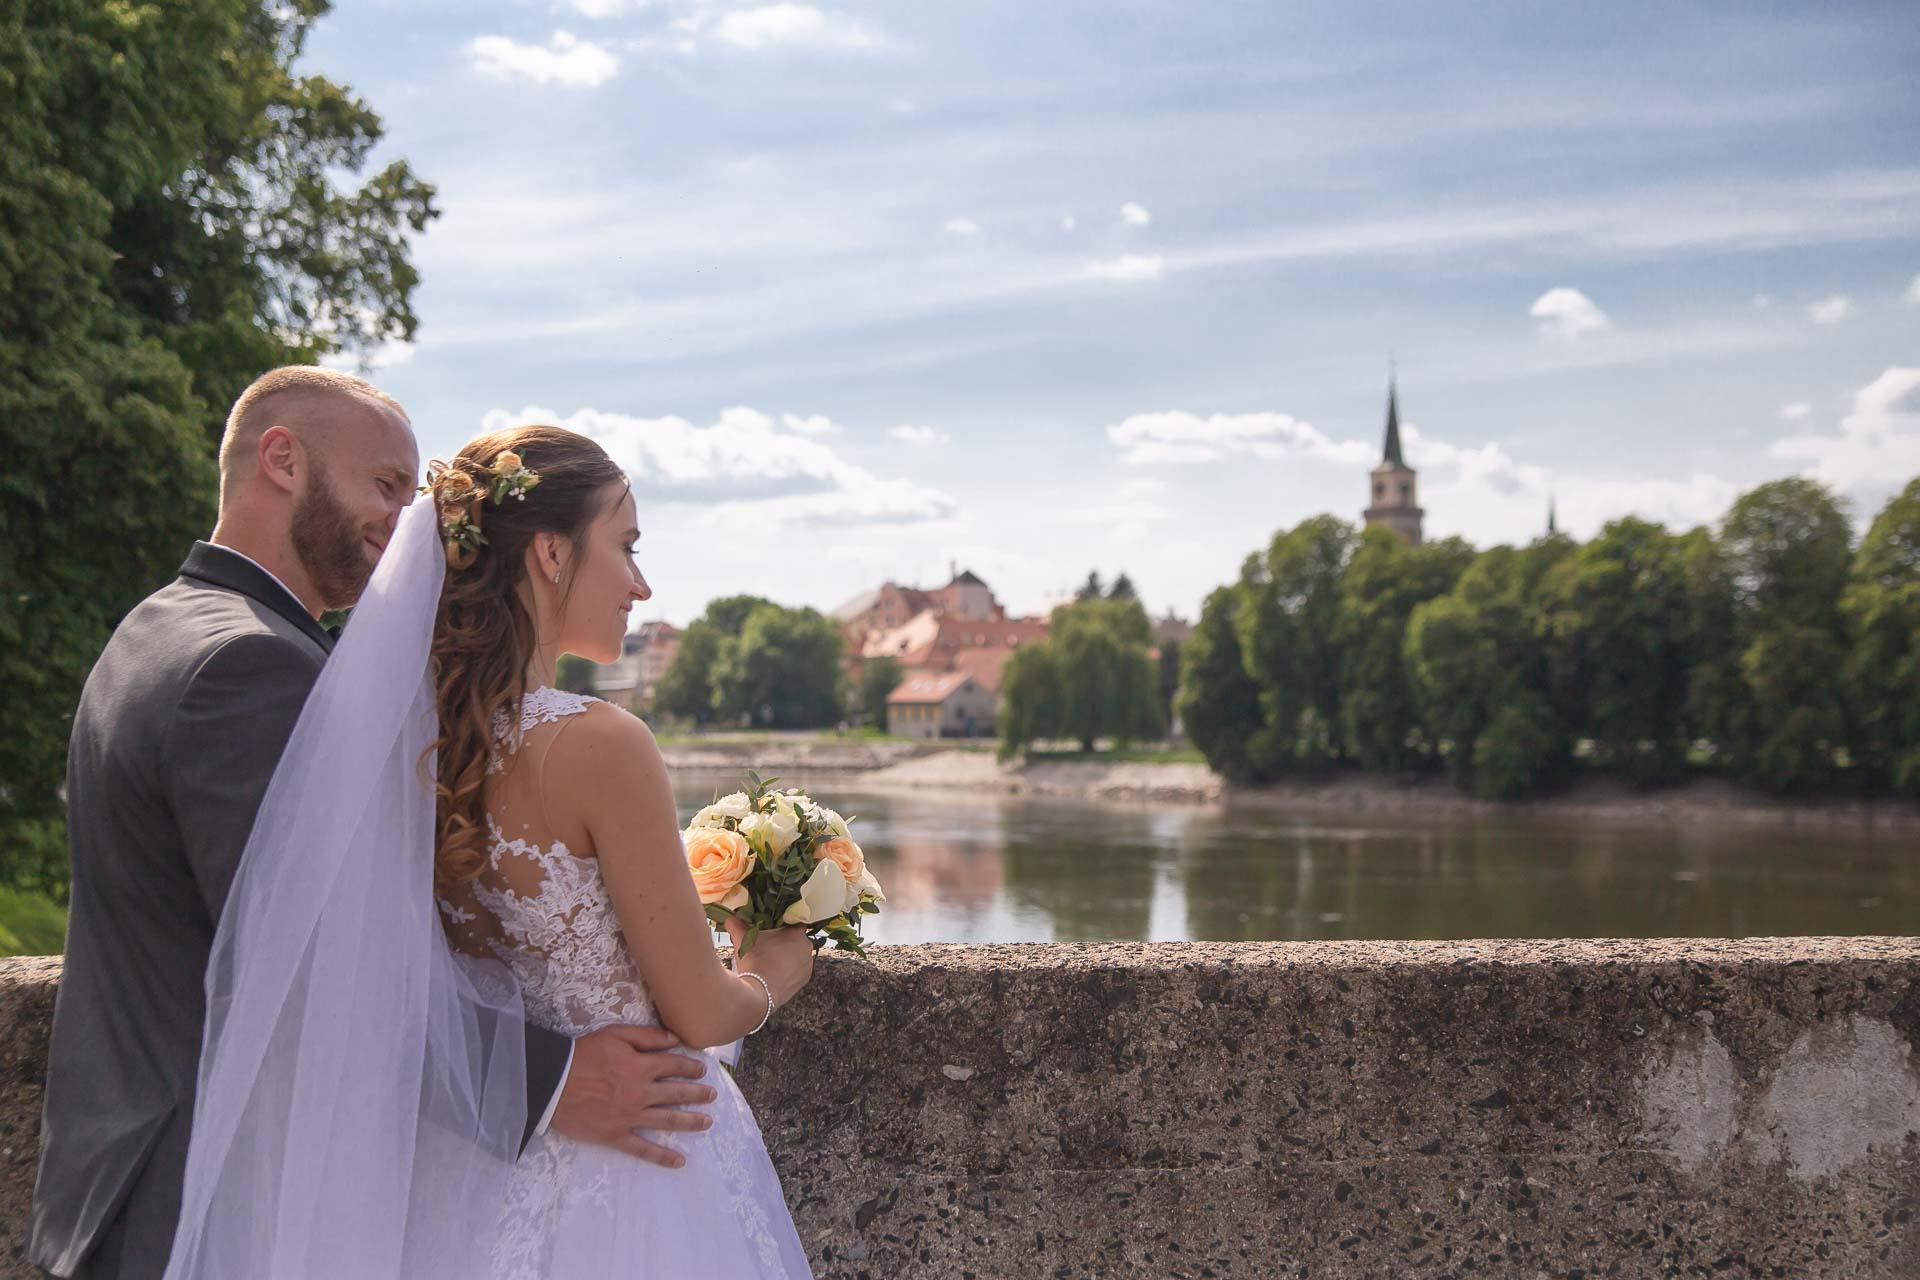 svatební-fotograf-svatebni-video-Nymburk-hotel-Ostrov-Beautyfoto-6138